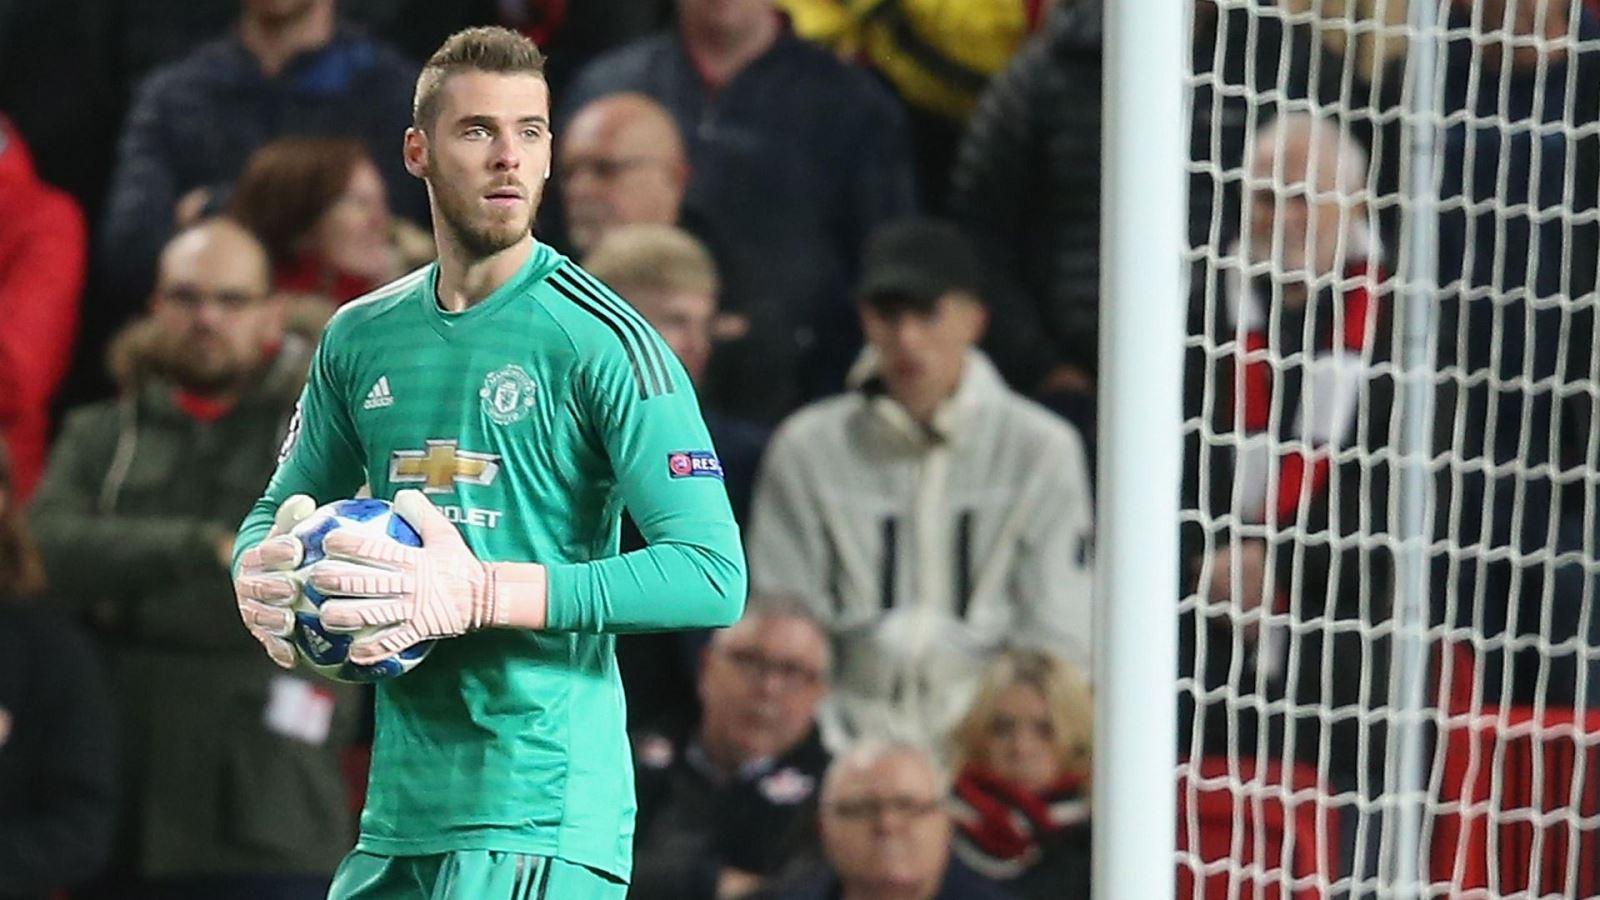 MU, M.U, Manchester United, Mourinho, Mourinho từ chức, Mourinho bị sa thải, sa thải Mourinho, ai thay thế Mourinho, Zidane thay Mourinho, Giggs, chuyển nhượng MU